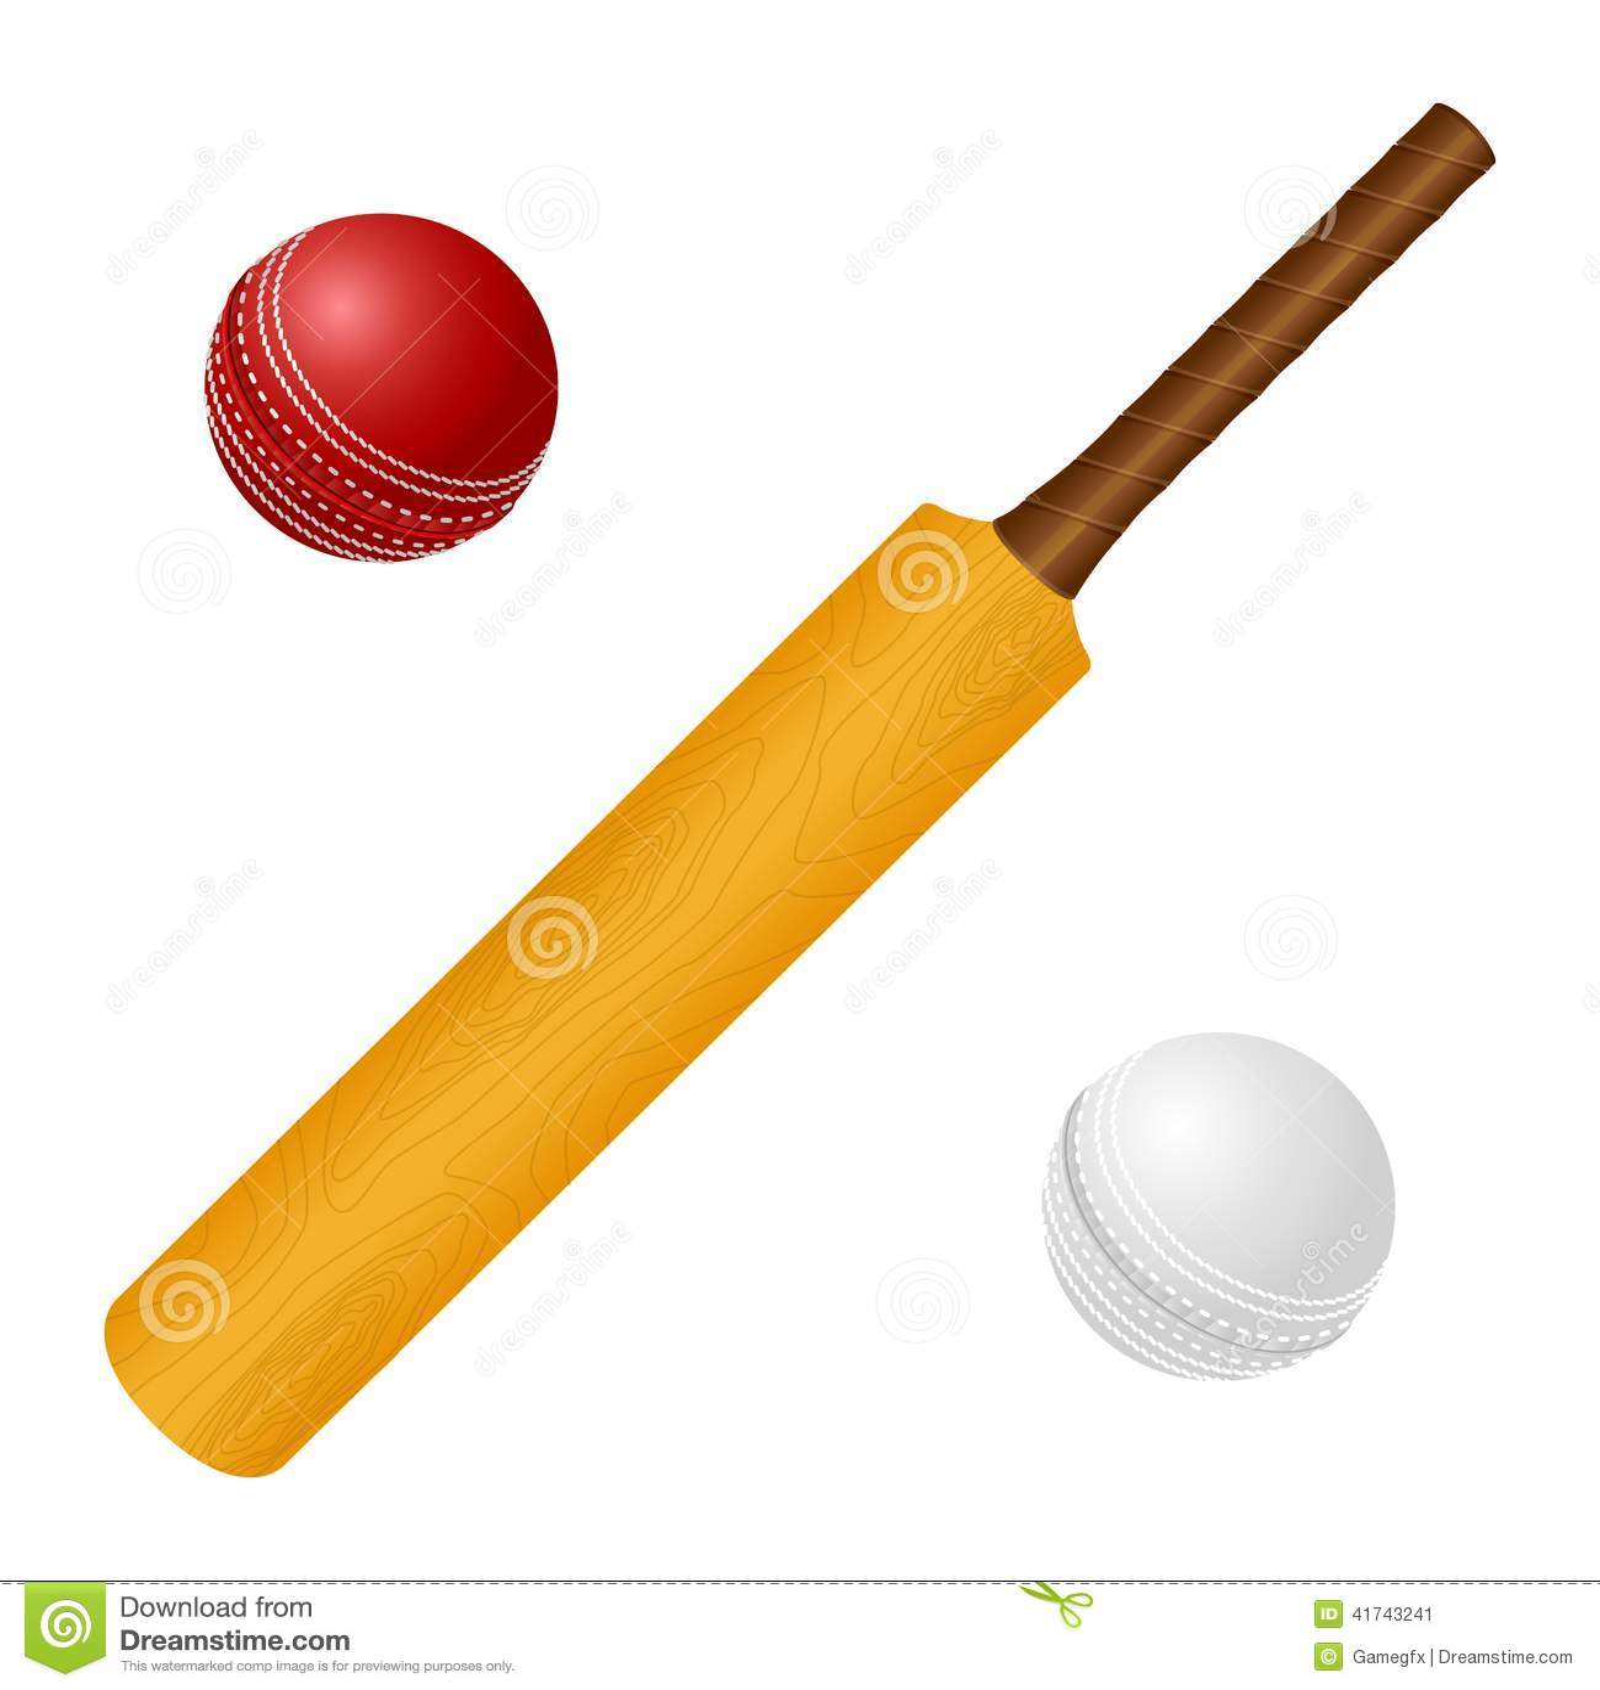 how to make cricket bat